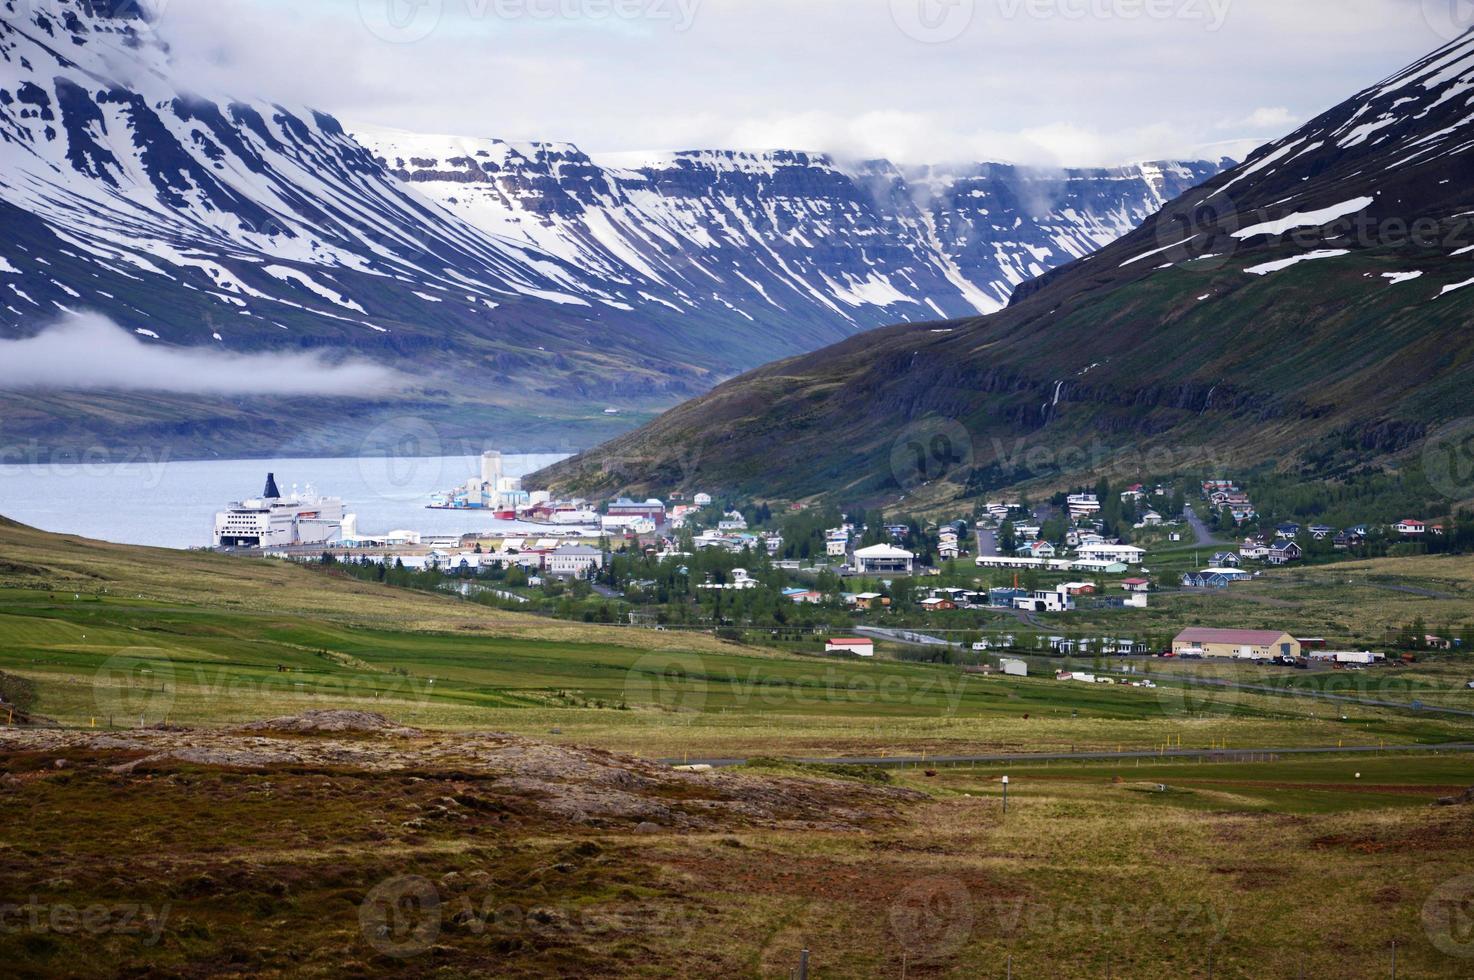 Fjord in Iceland, region of Austurland photo